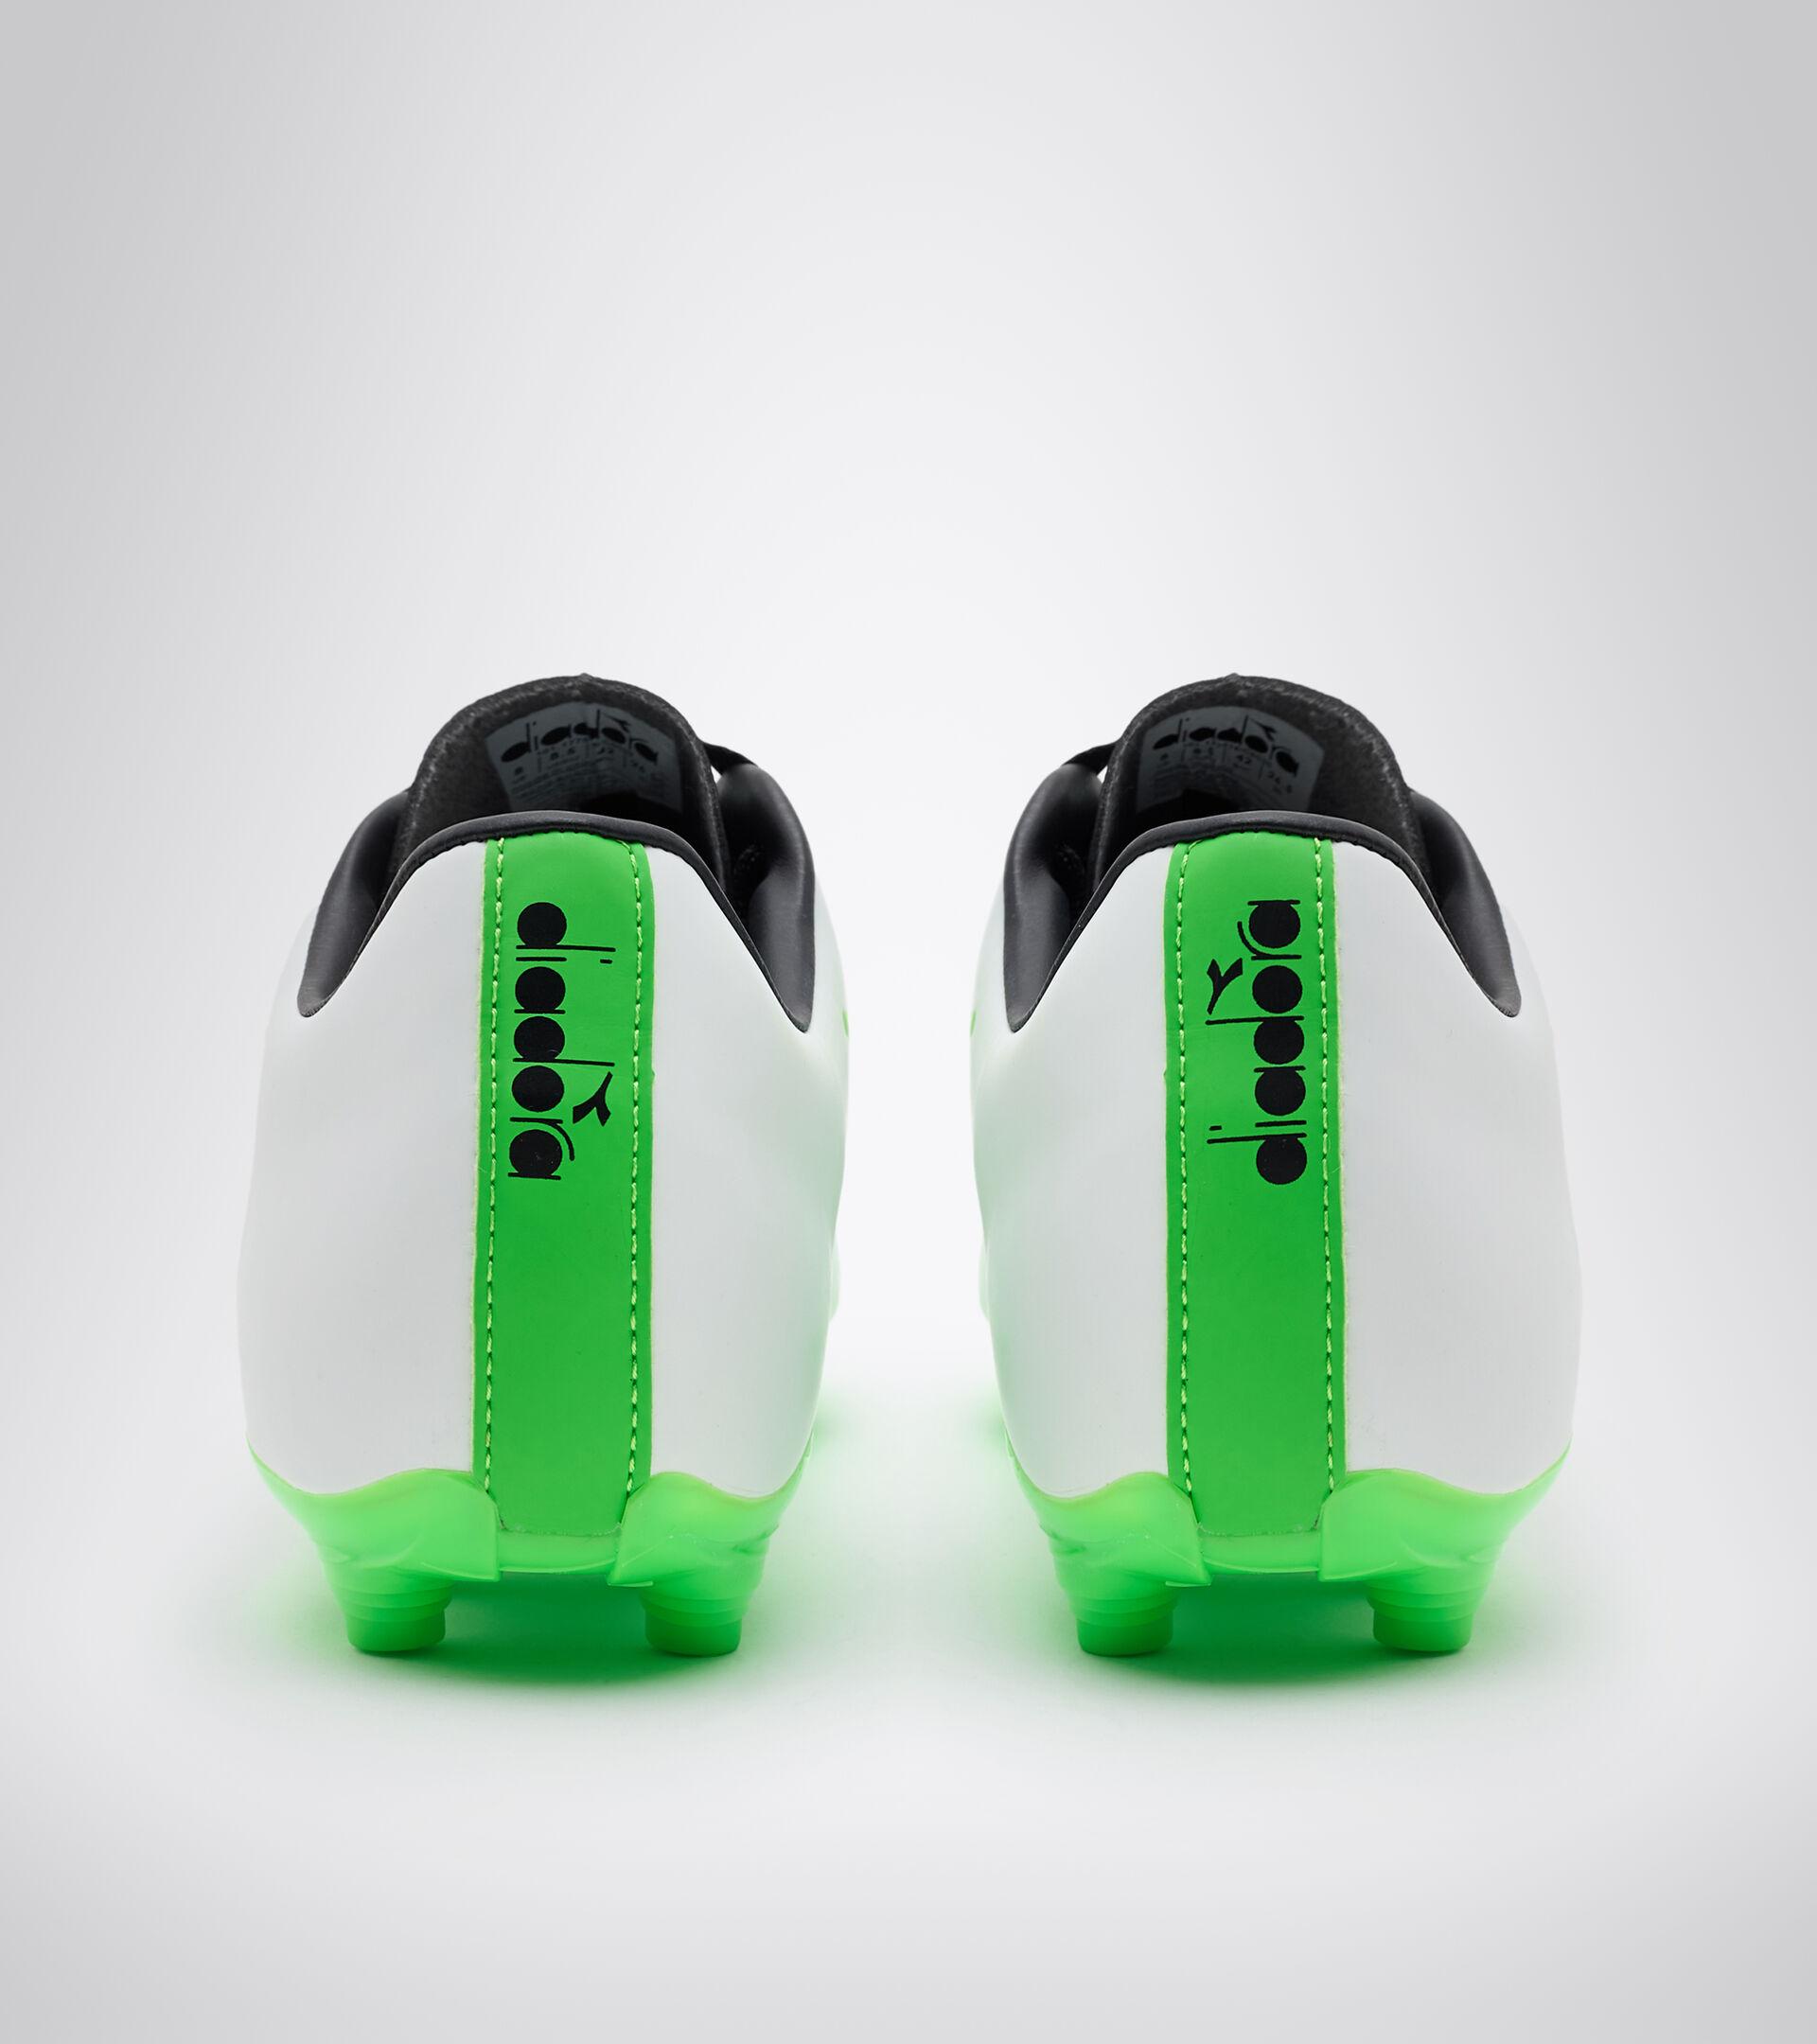 Botas de fútbol para superficies compactas - Unisex PICHICHI 4 MG14 BLANCO/VERDE FLUO/NEGRO - Diadora